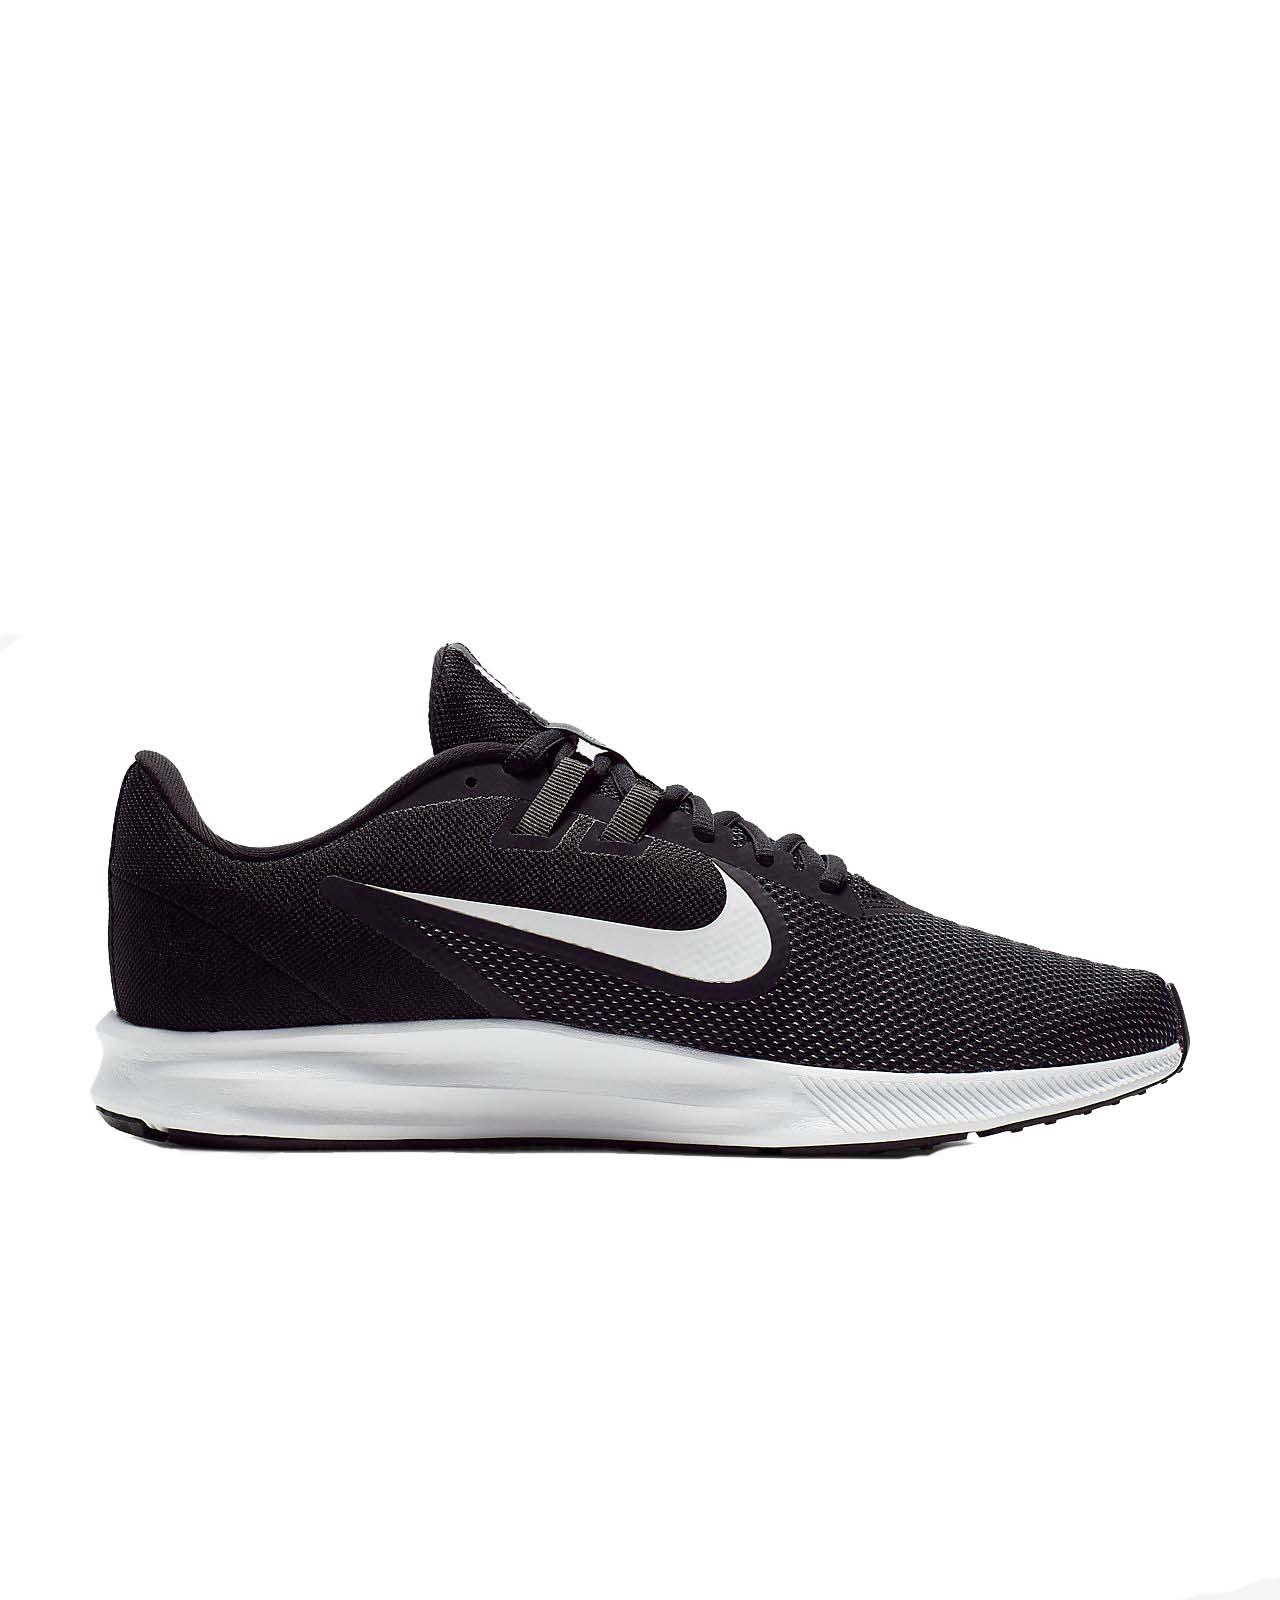 Nike-Men-039-s-Downshifter-9-Wide-Running-Shoes thumbnail 3